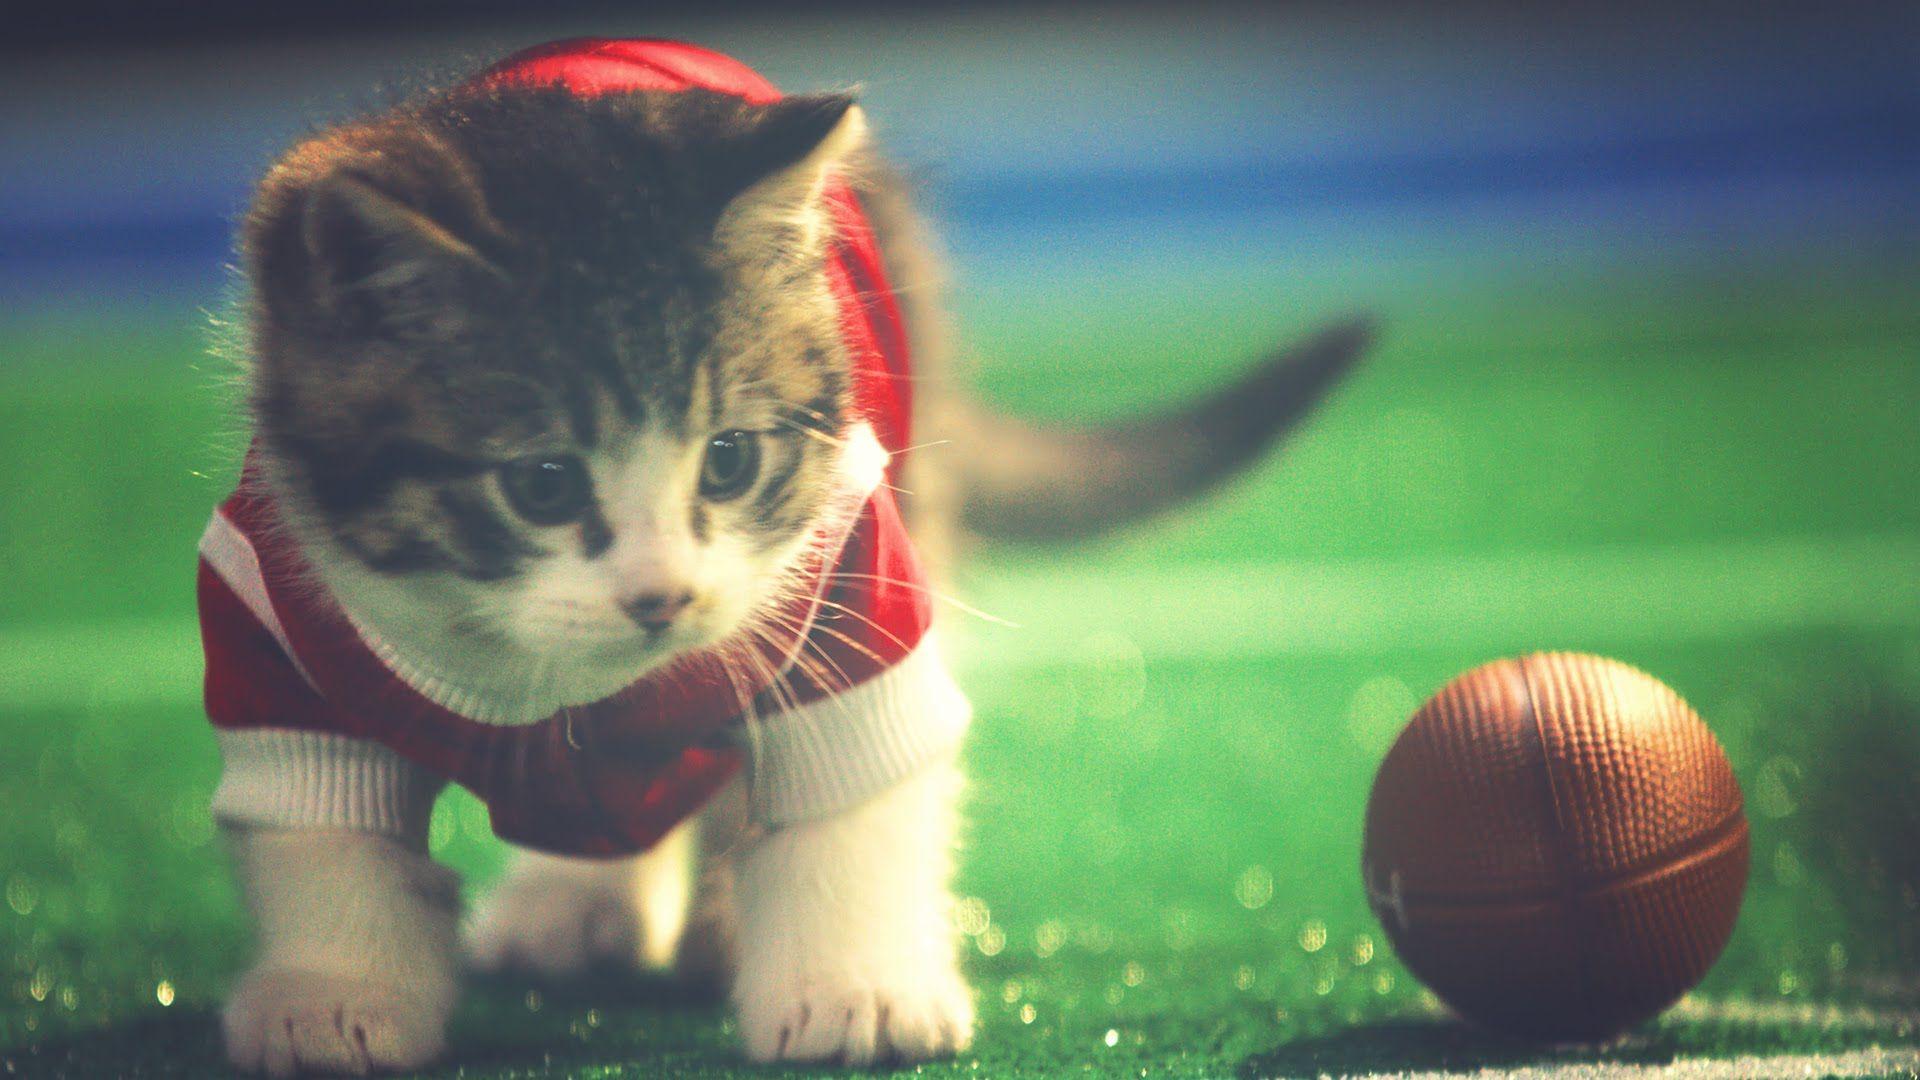 Cute Kittens Play Football Kittenbowl Kittens Cutest Kittens Playing Kitten Photos